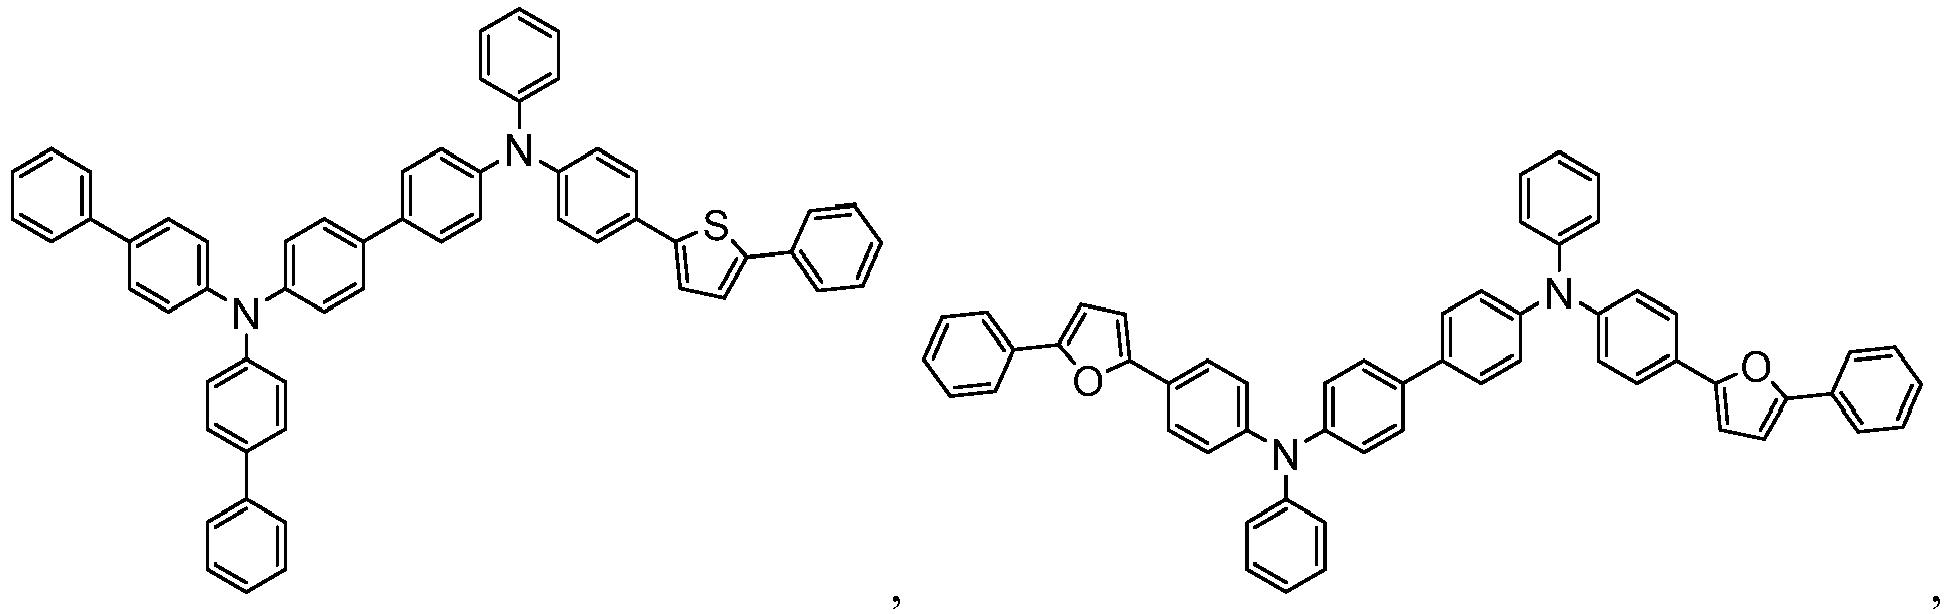 Figure imgb0843